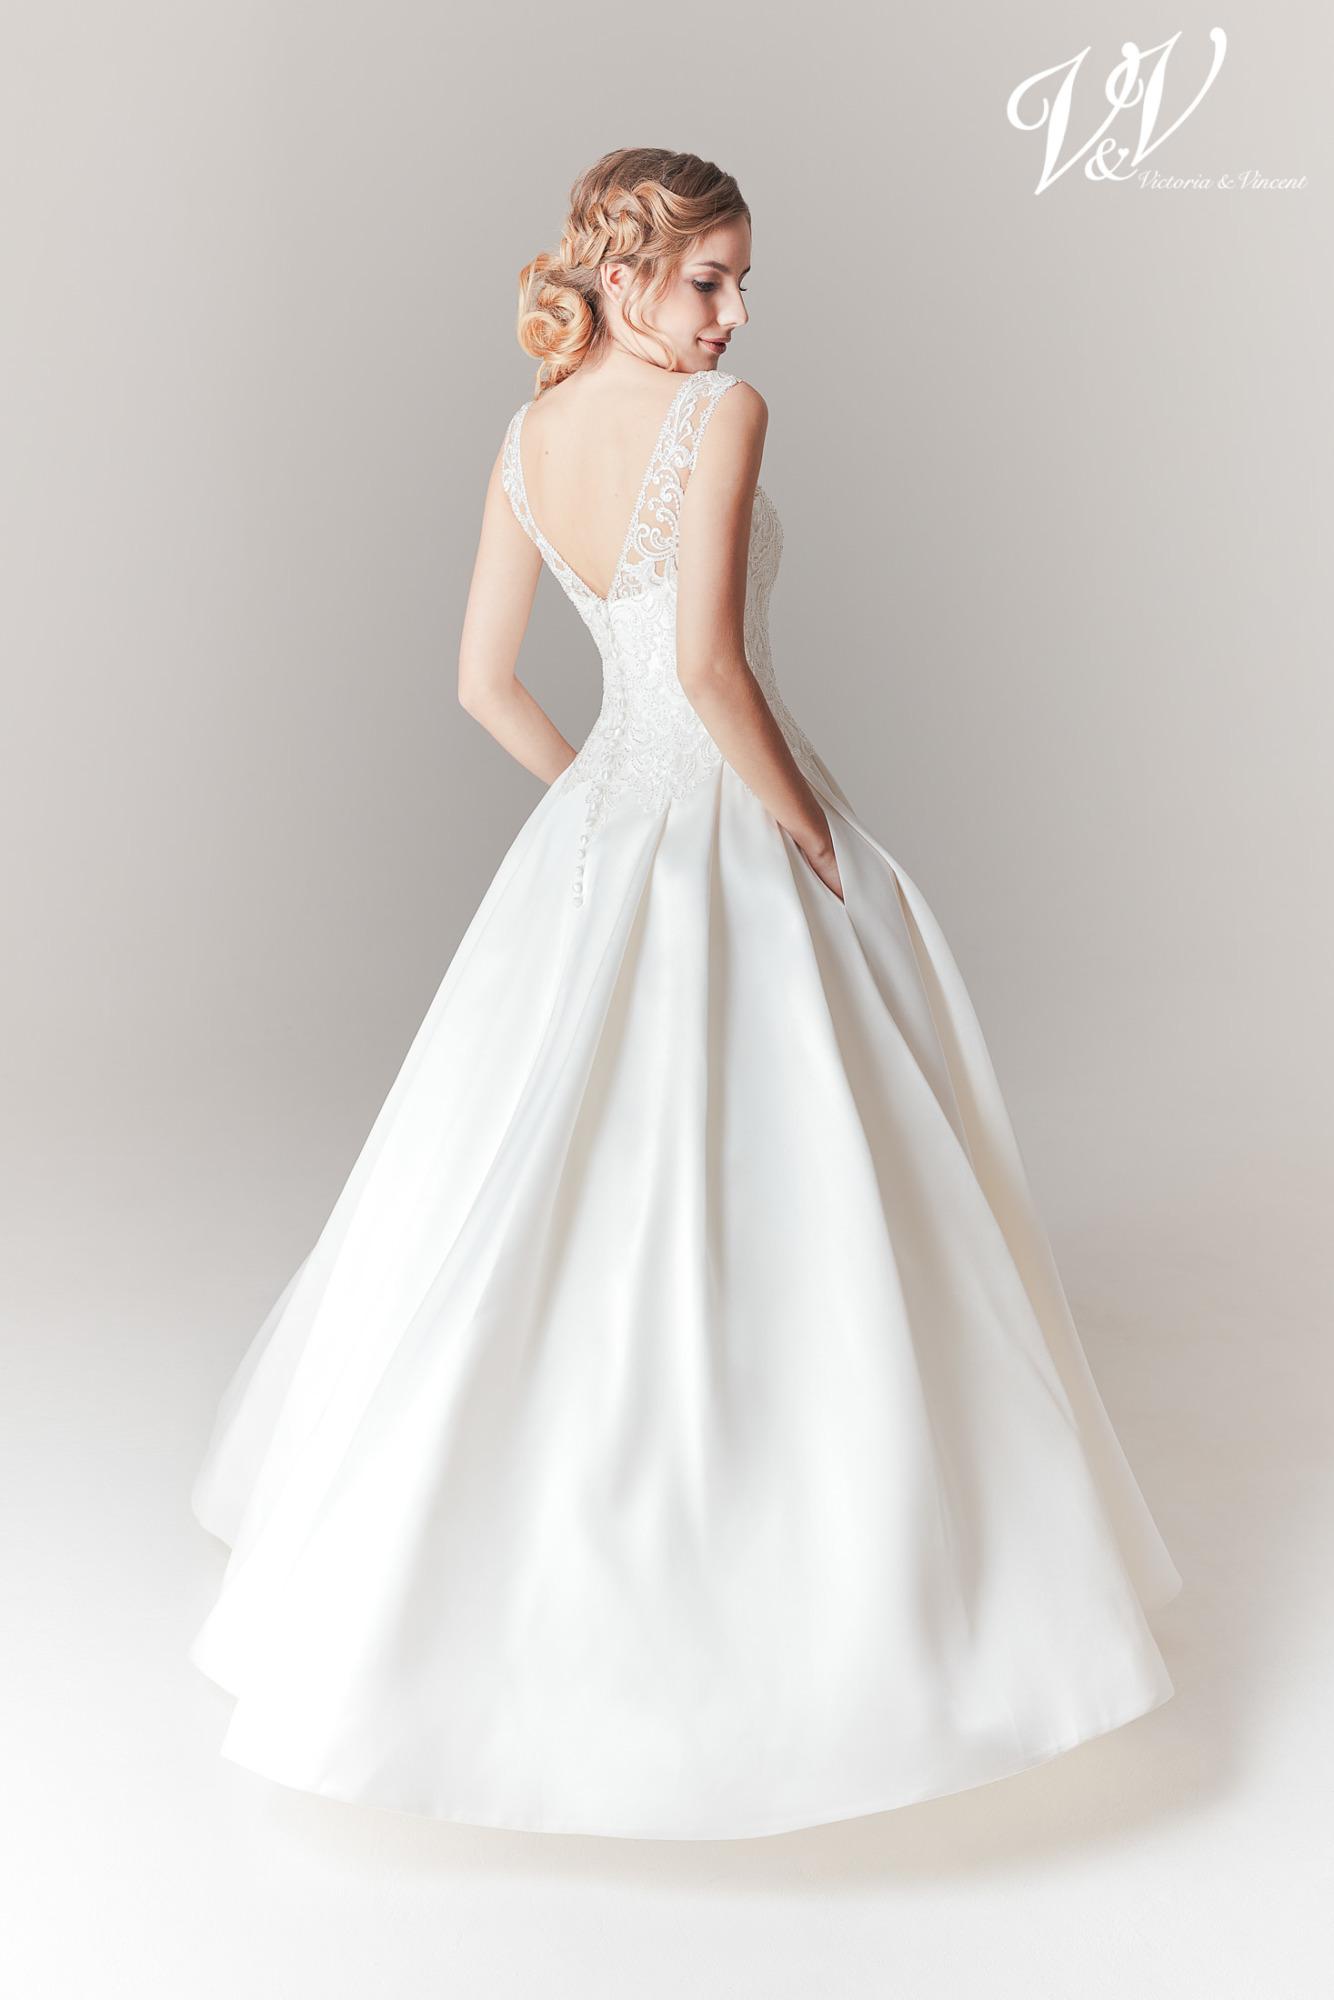 Premium quality wedding dress-Victoria & Vincent